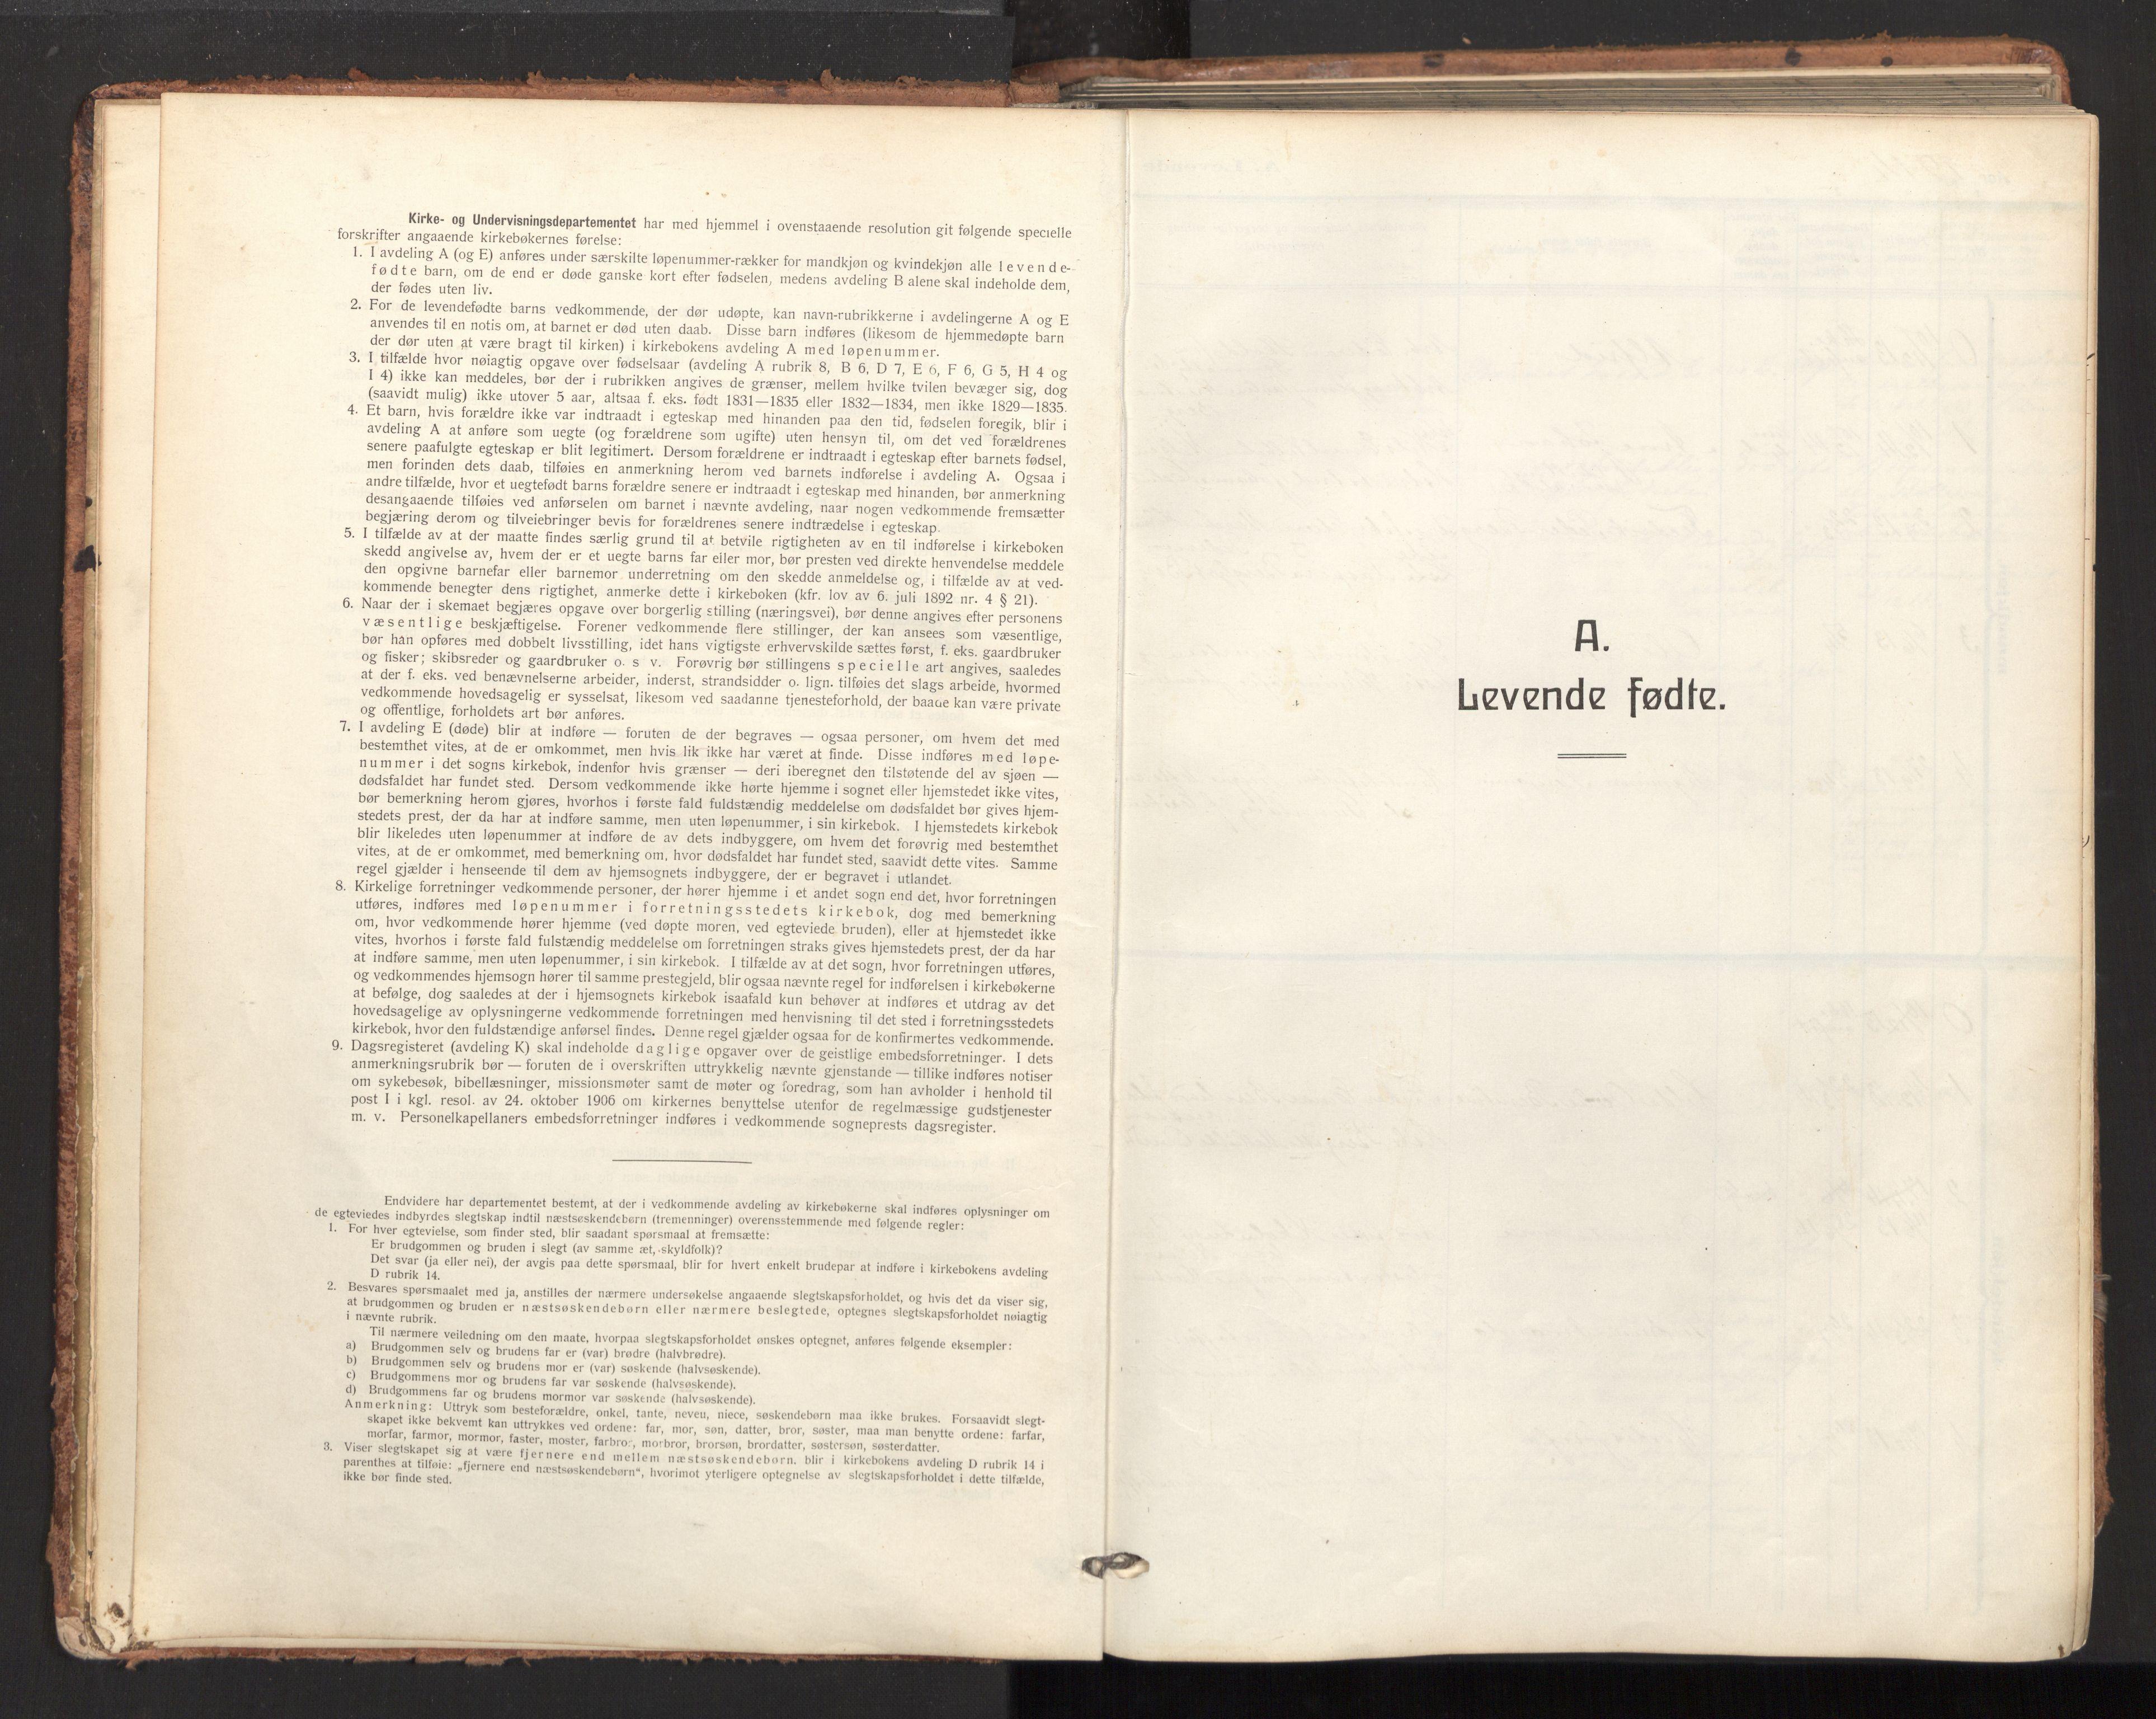 SAT, Ministerialprotokoller, klokkerbøker og fødselsregistre - Nordland, 893/L1343: Ministerialbok nr. 893A15, 1914-1928